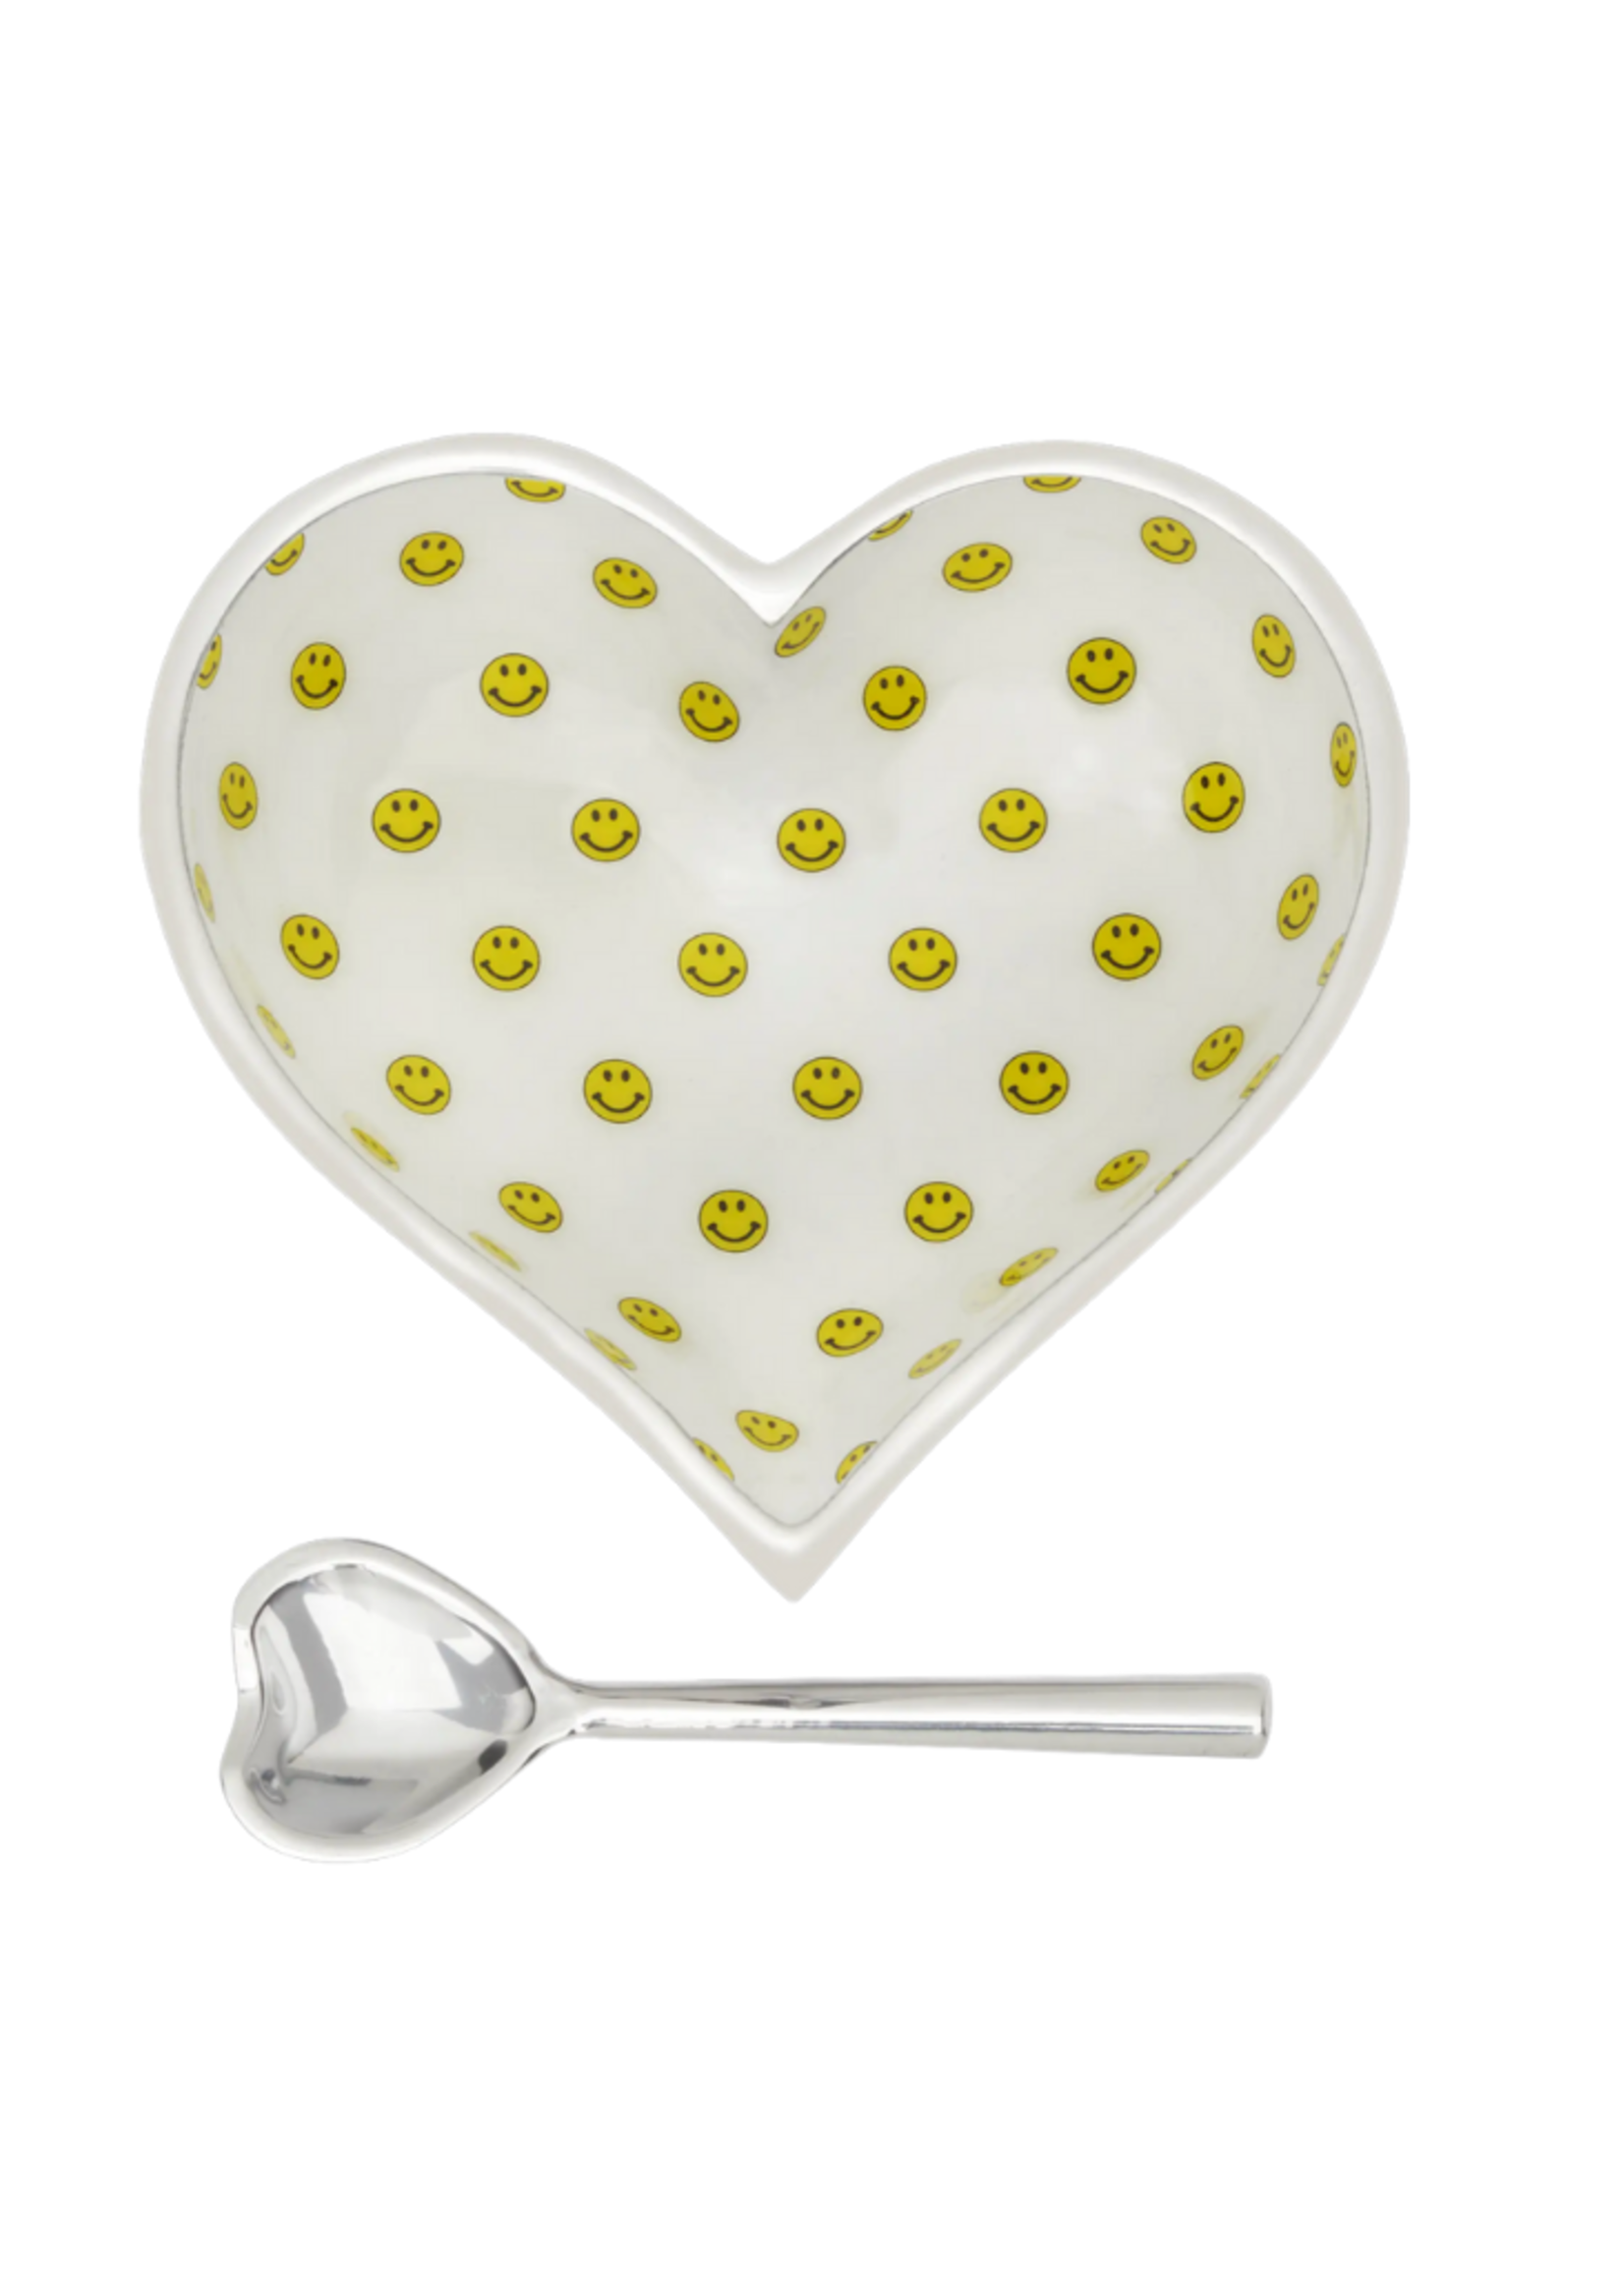 Happy Heart Bowl w Spoon //  Lil Smiles